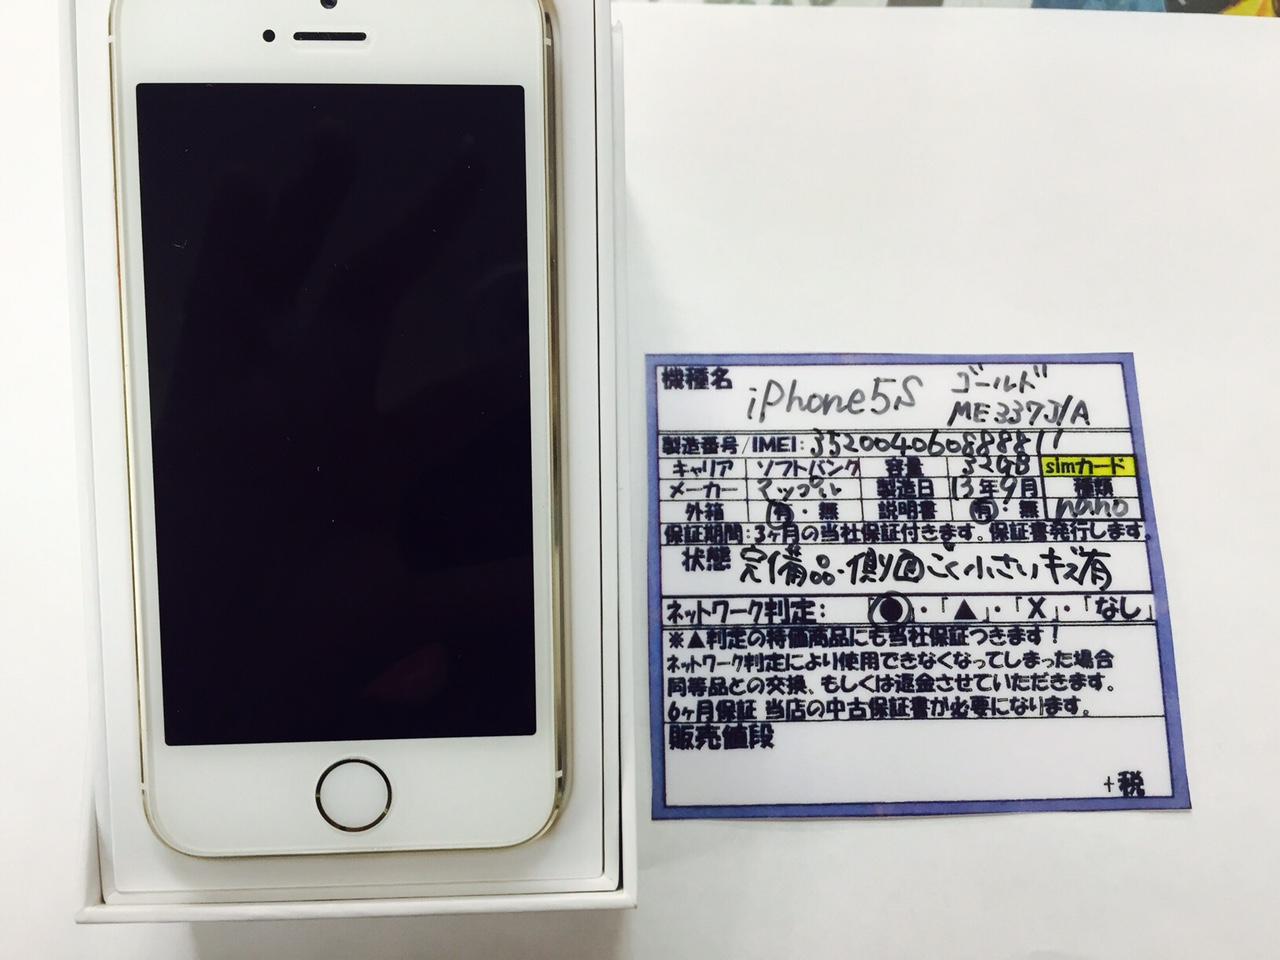 iPhone5S ソフトバンク ME227J ゴールド 白ロム 判定○